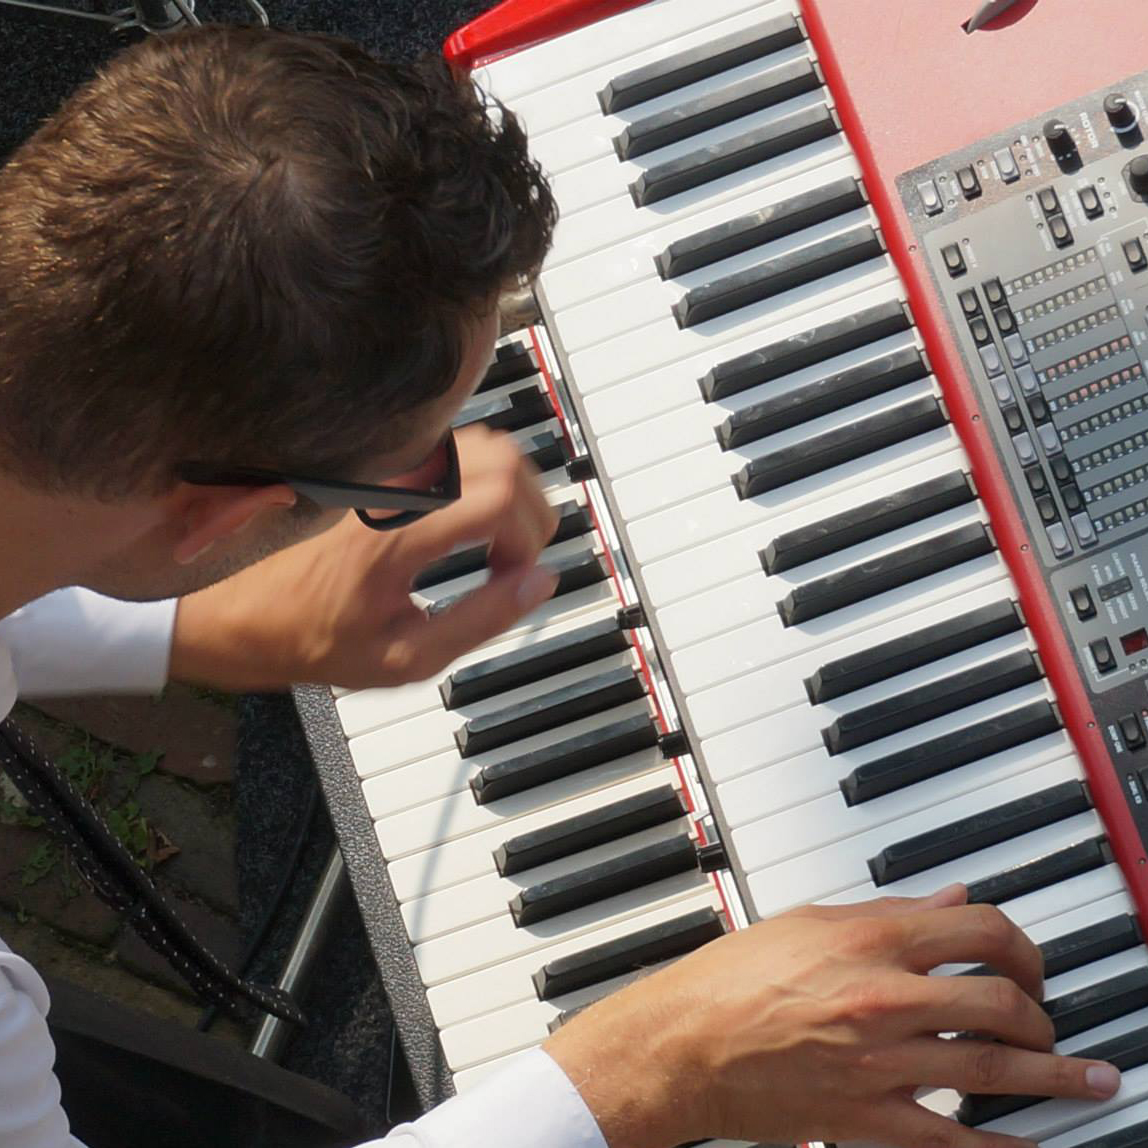 Born SandersNord - Freelance musician